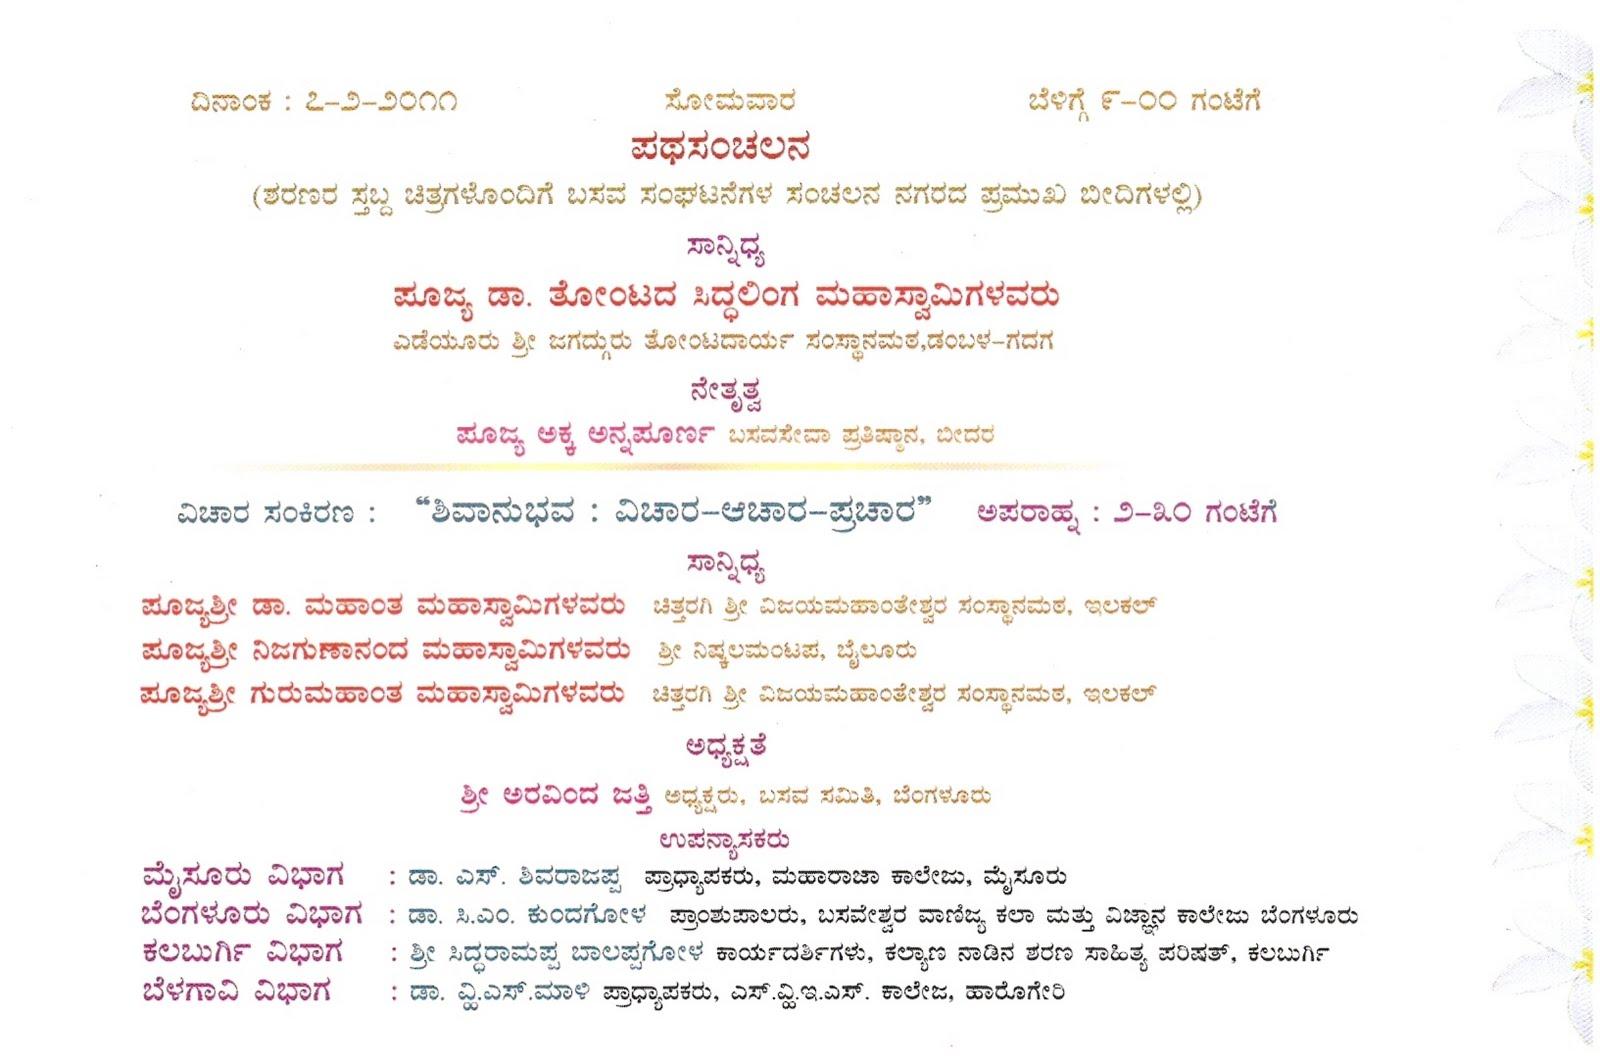 Wedding Invitation Wording: Wedding Invitation Templates ...